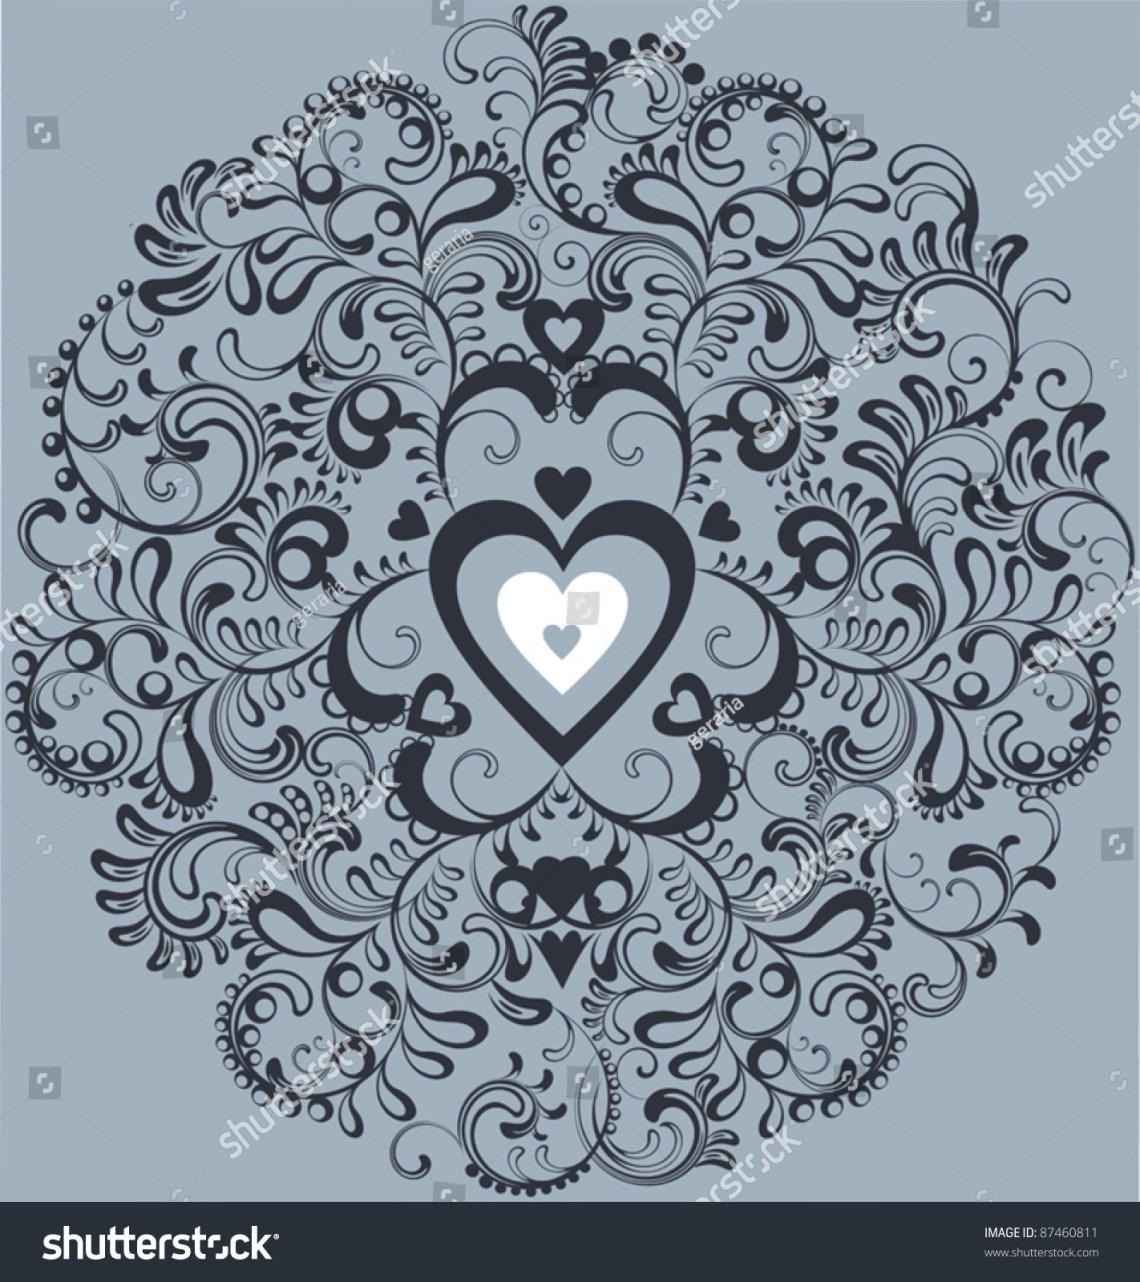 Download Vintage White Heart Ornamental Flourish Circle Stock ...